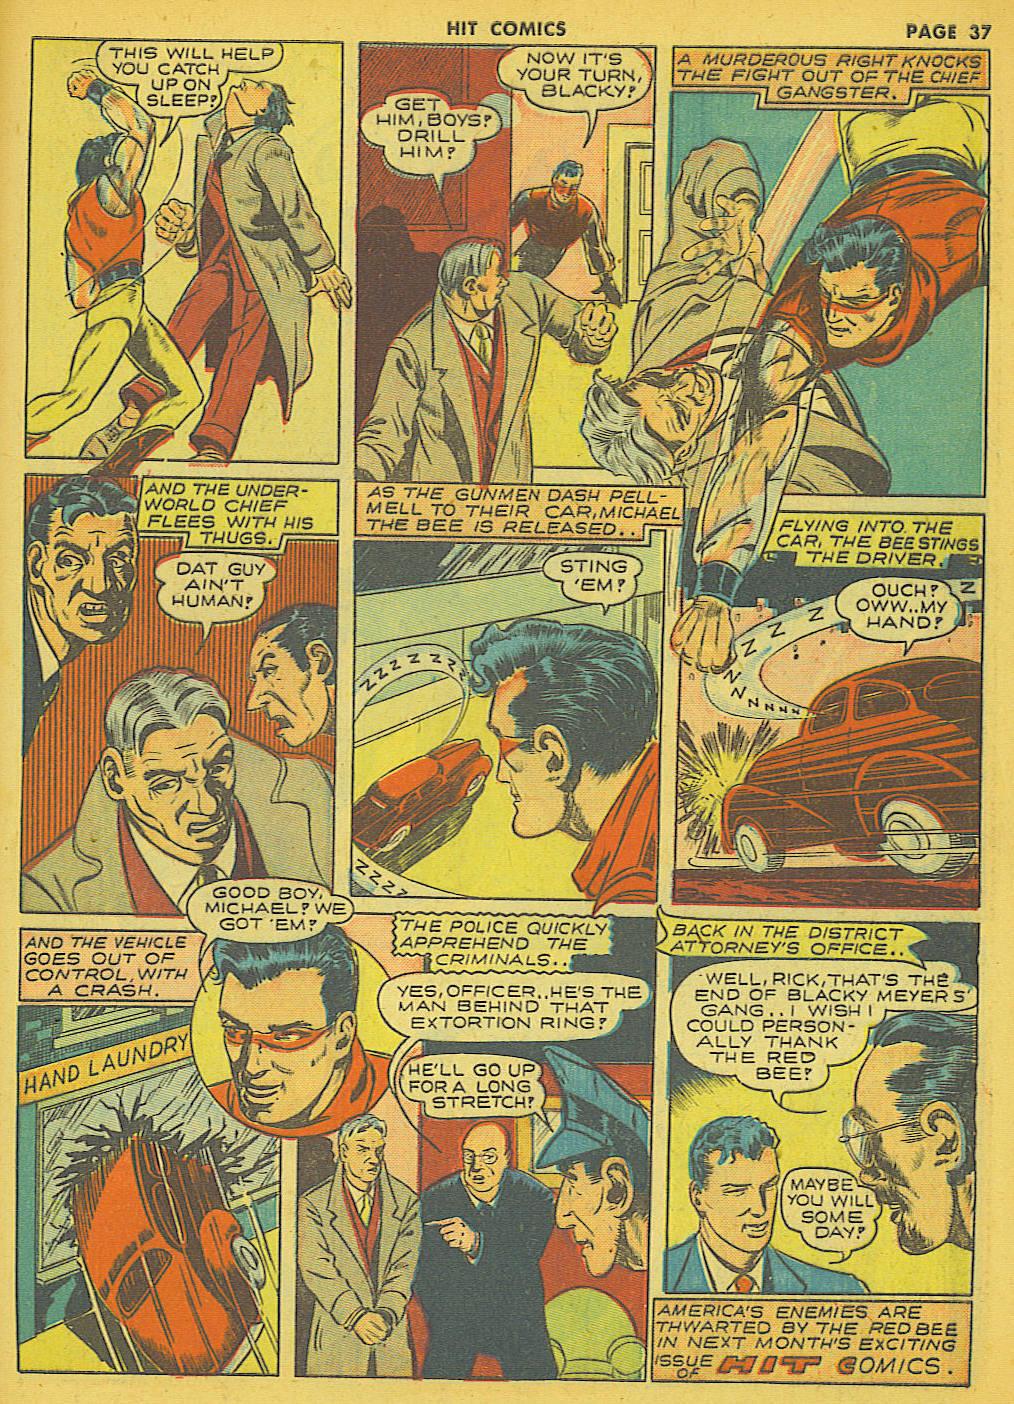 Read online Hit Comics comic -  Issue #21 - 39